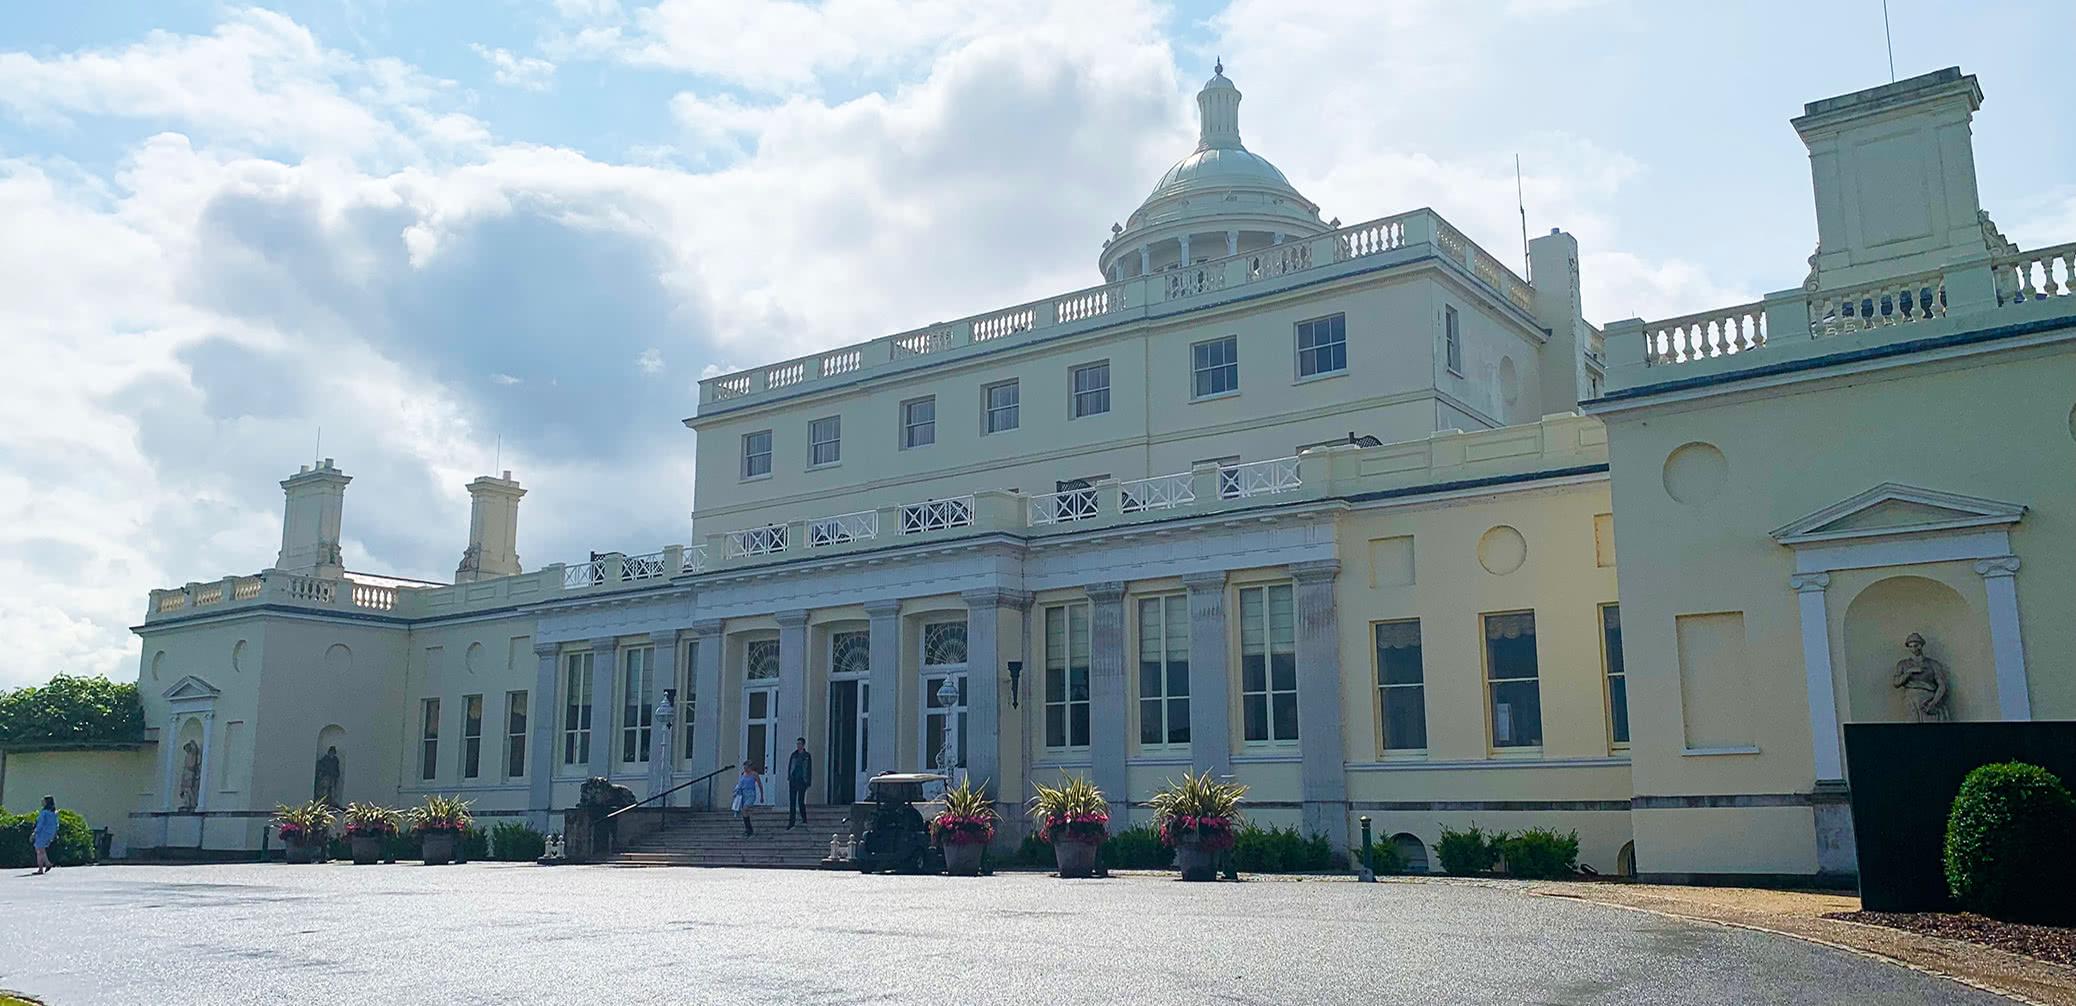 Review: Stoke Park, Buckinghamshire